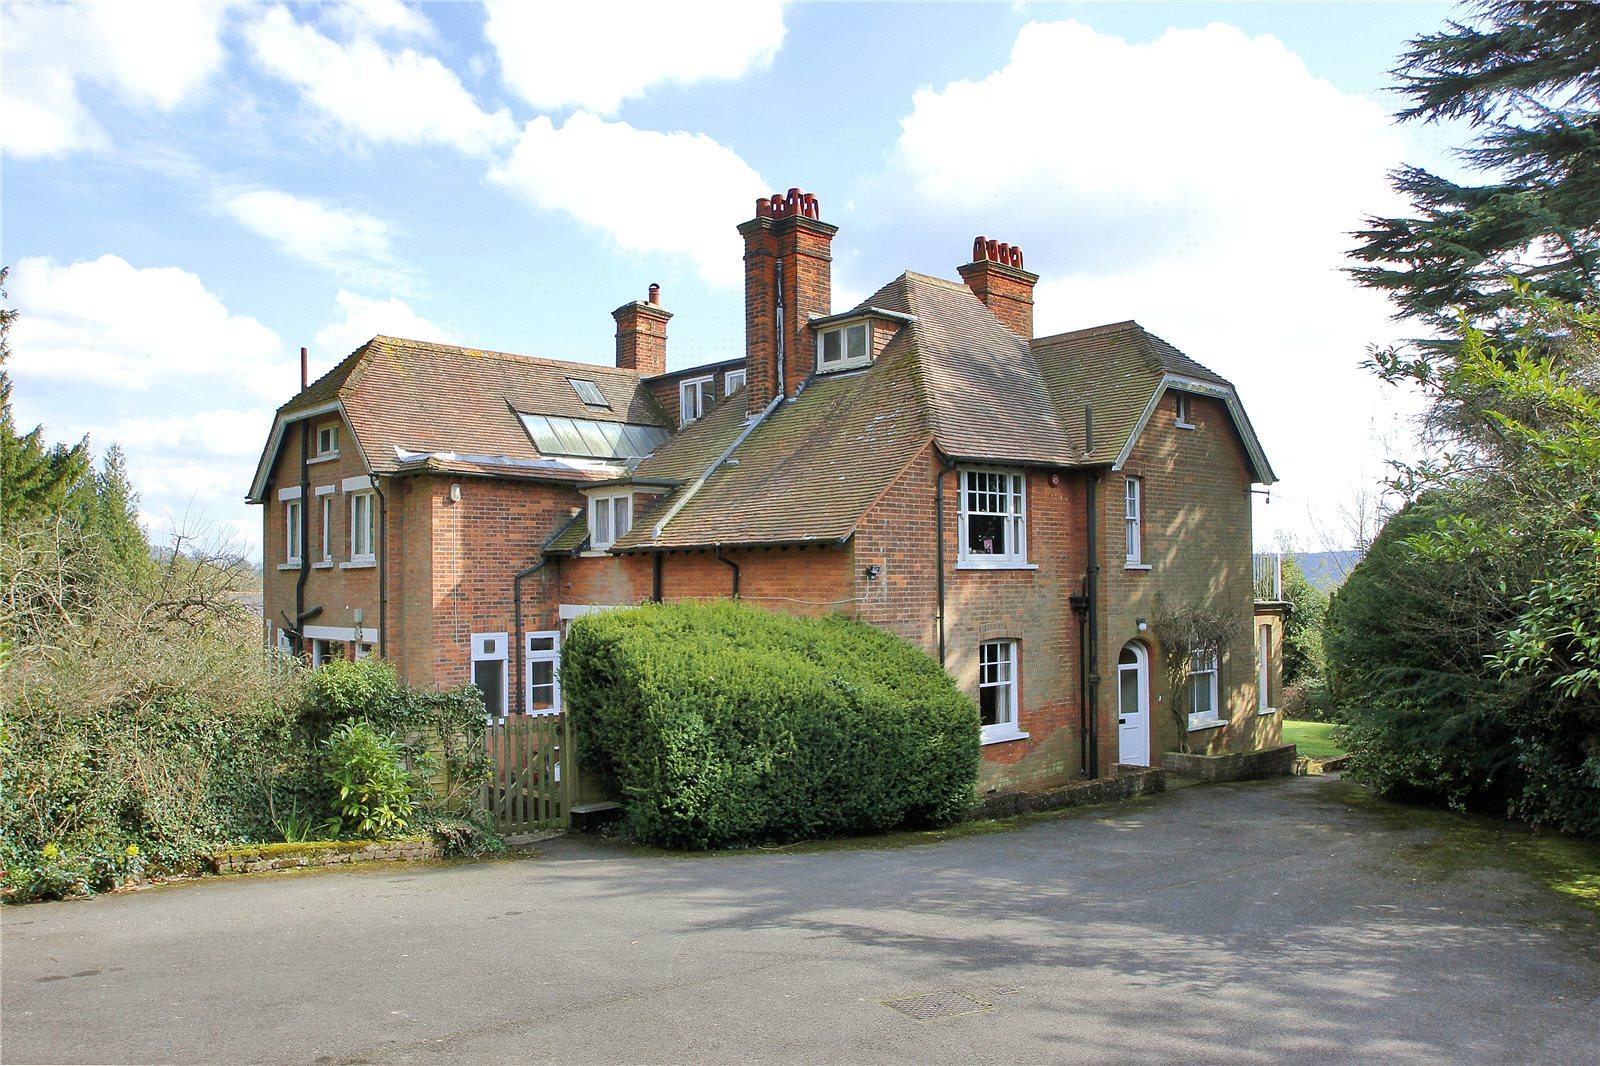 Tek Ailelik Ev için Satış at Cotmans Ash Lane, Kemsing, Sevenoaks, Kent, TN15 Sevenoaks, Ingiltere